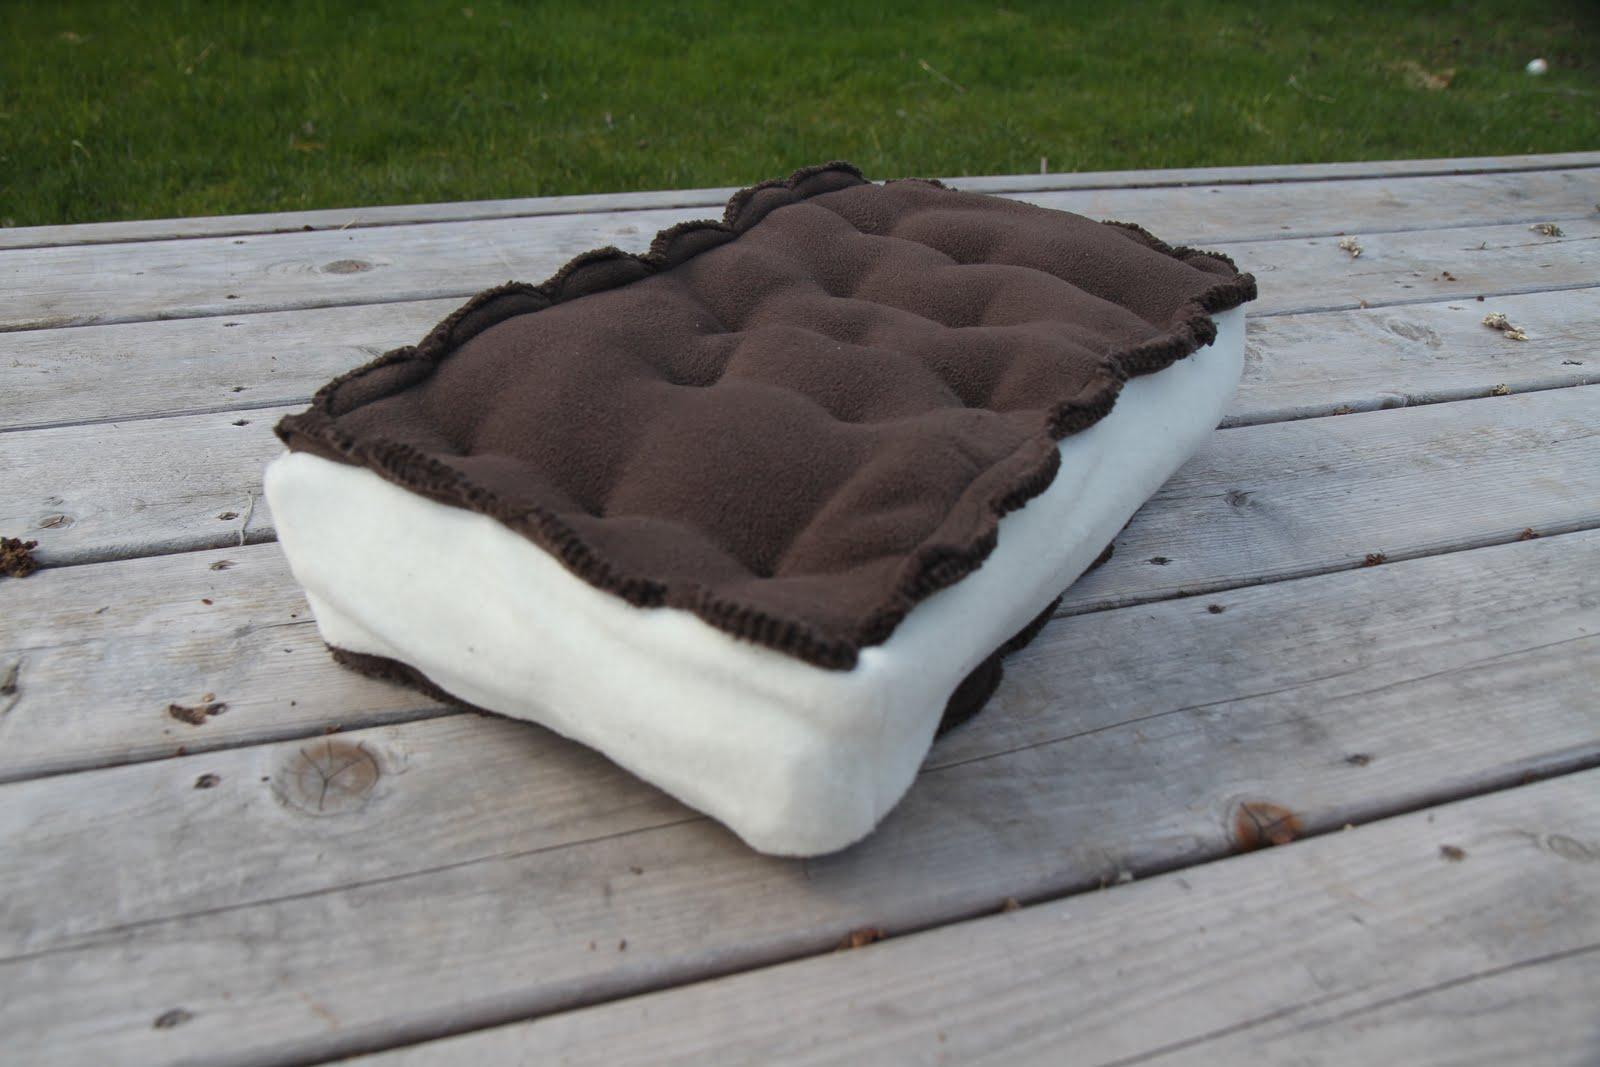 ice cream sandwich furniture. Ice Cream Sandwich Furniture. + Pillow \\u003d Tasty Comfort. Furniture W